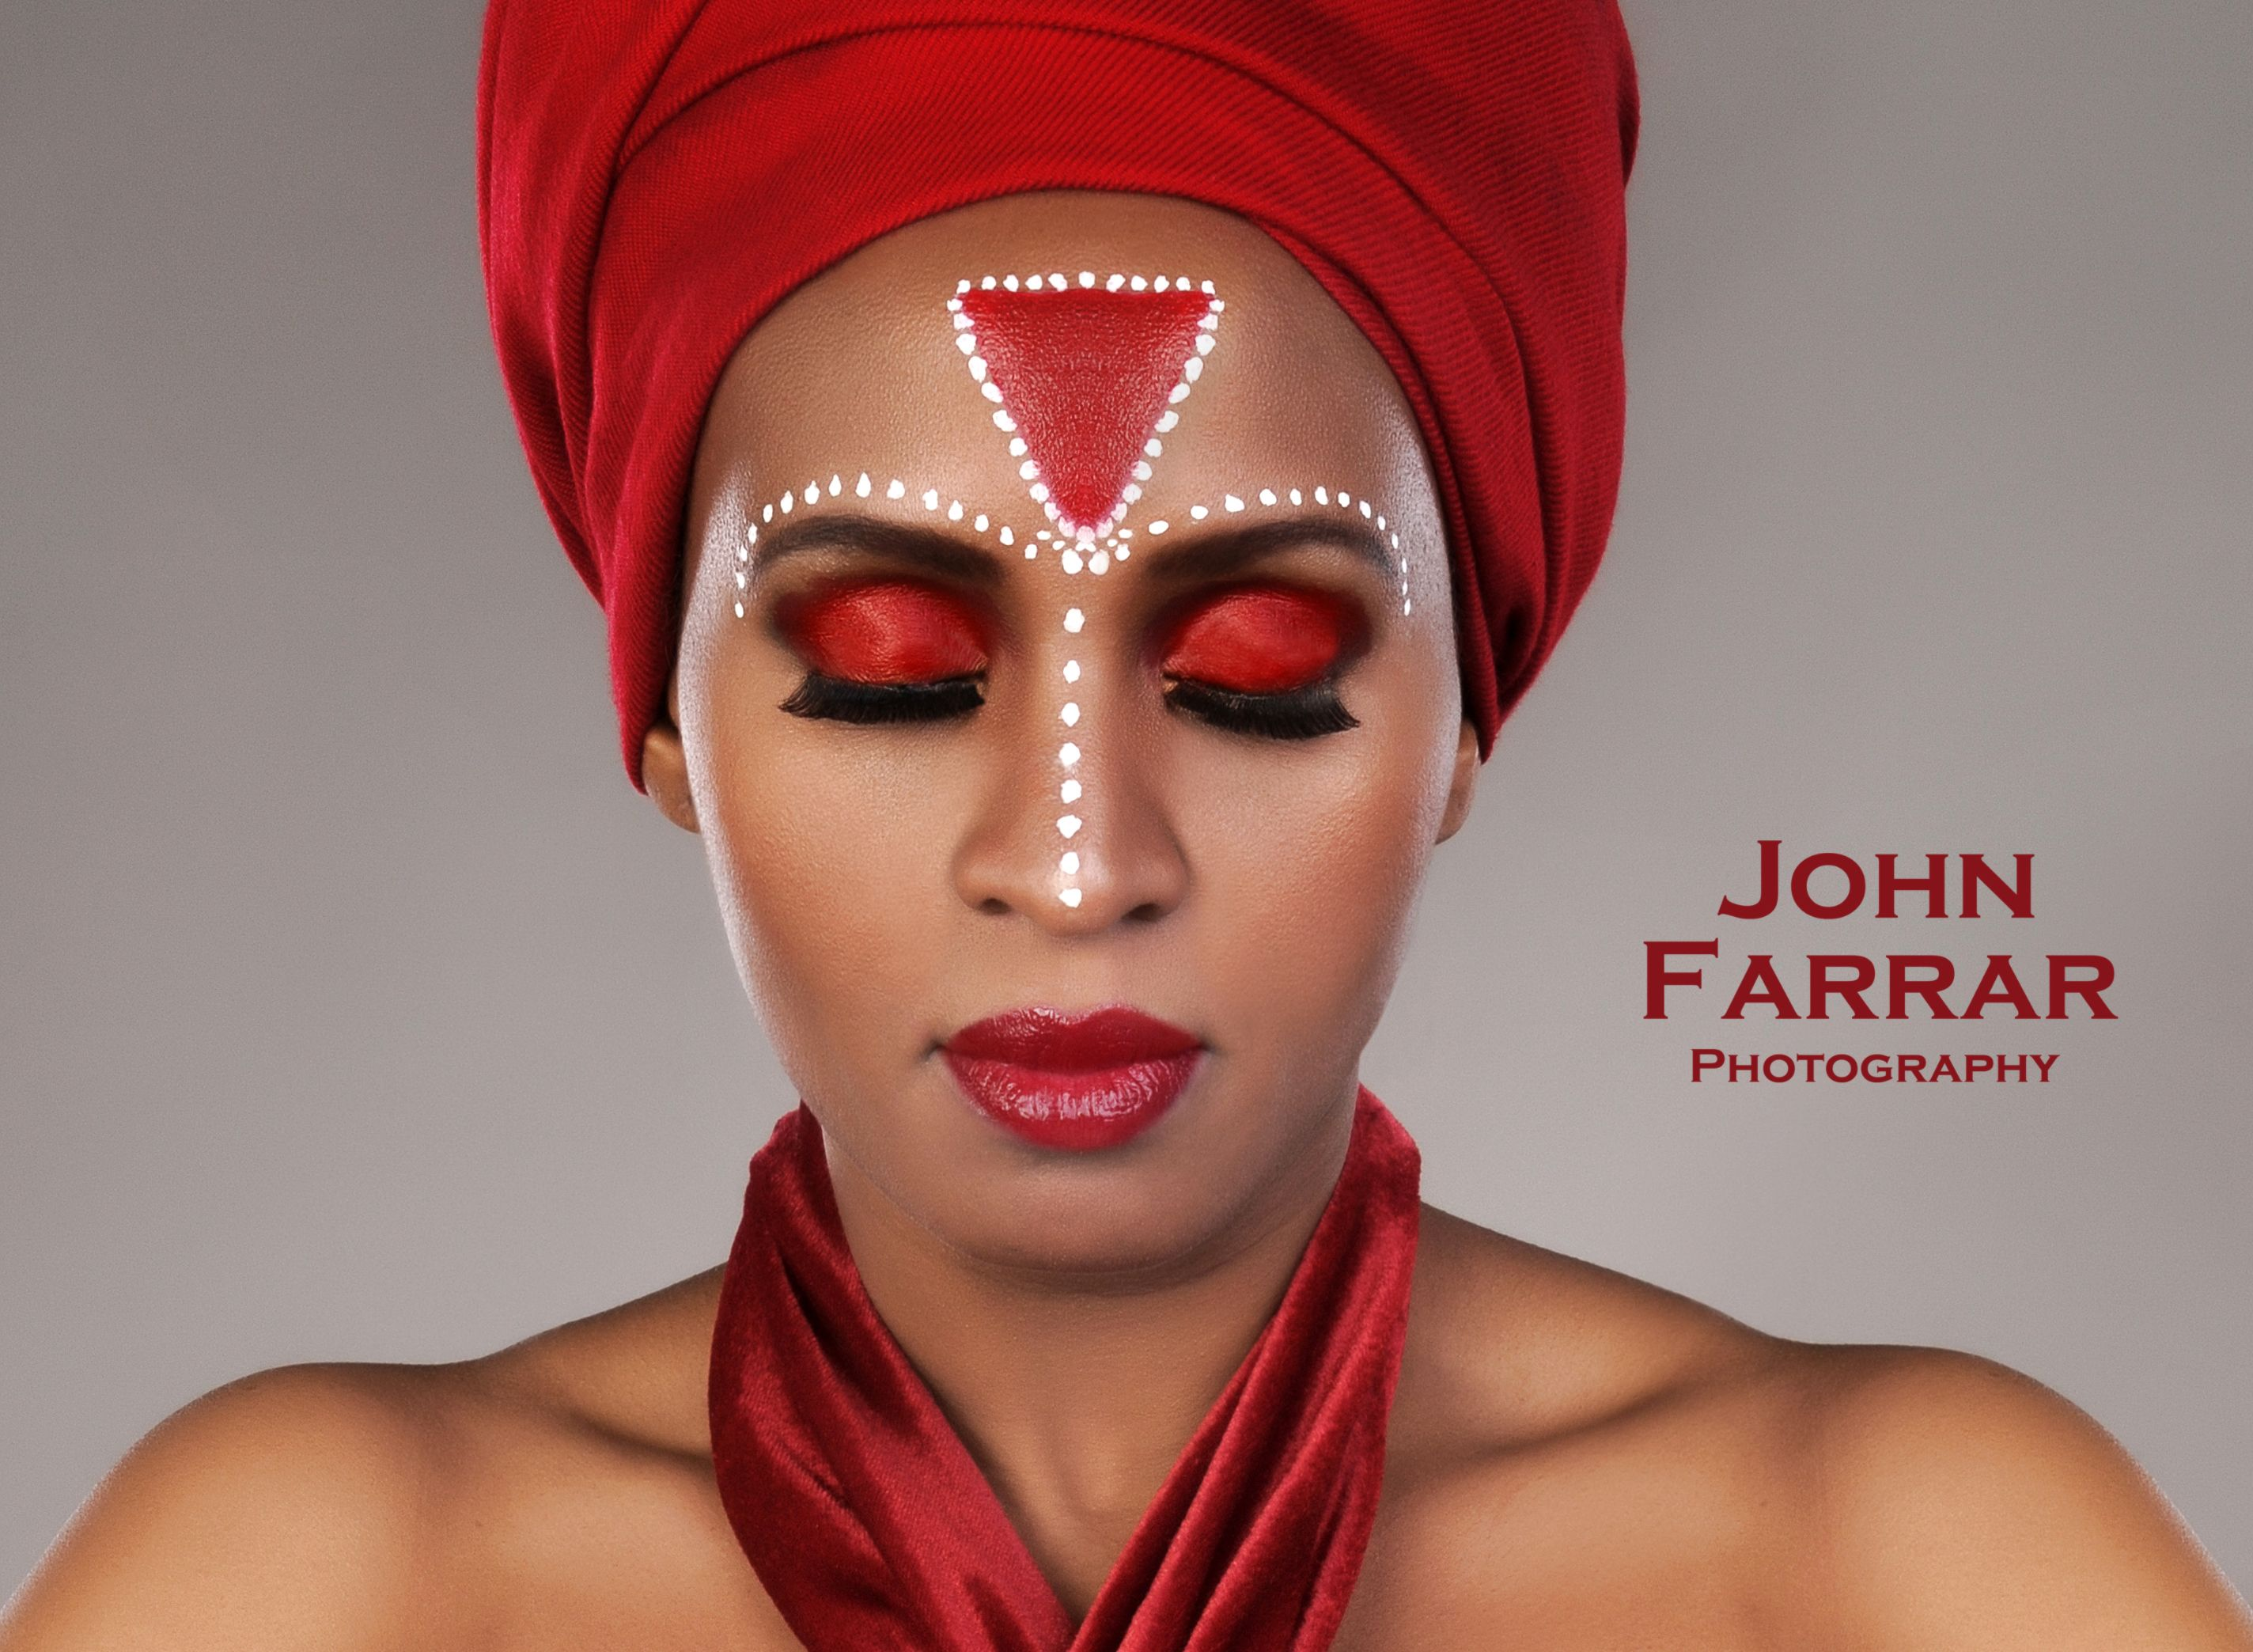 Creative African inspired makeup by Zulfa makeup artist. I